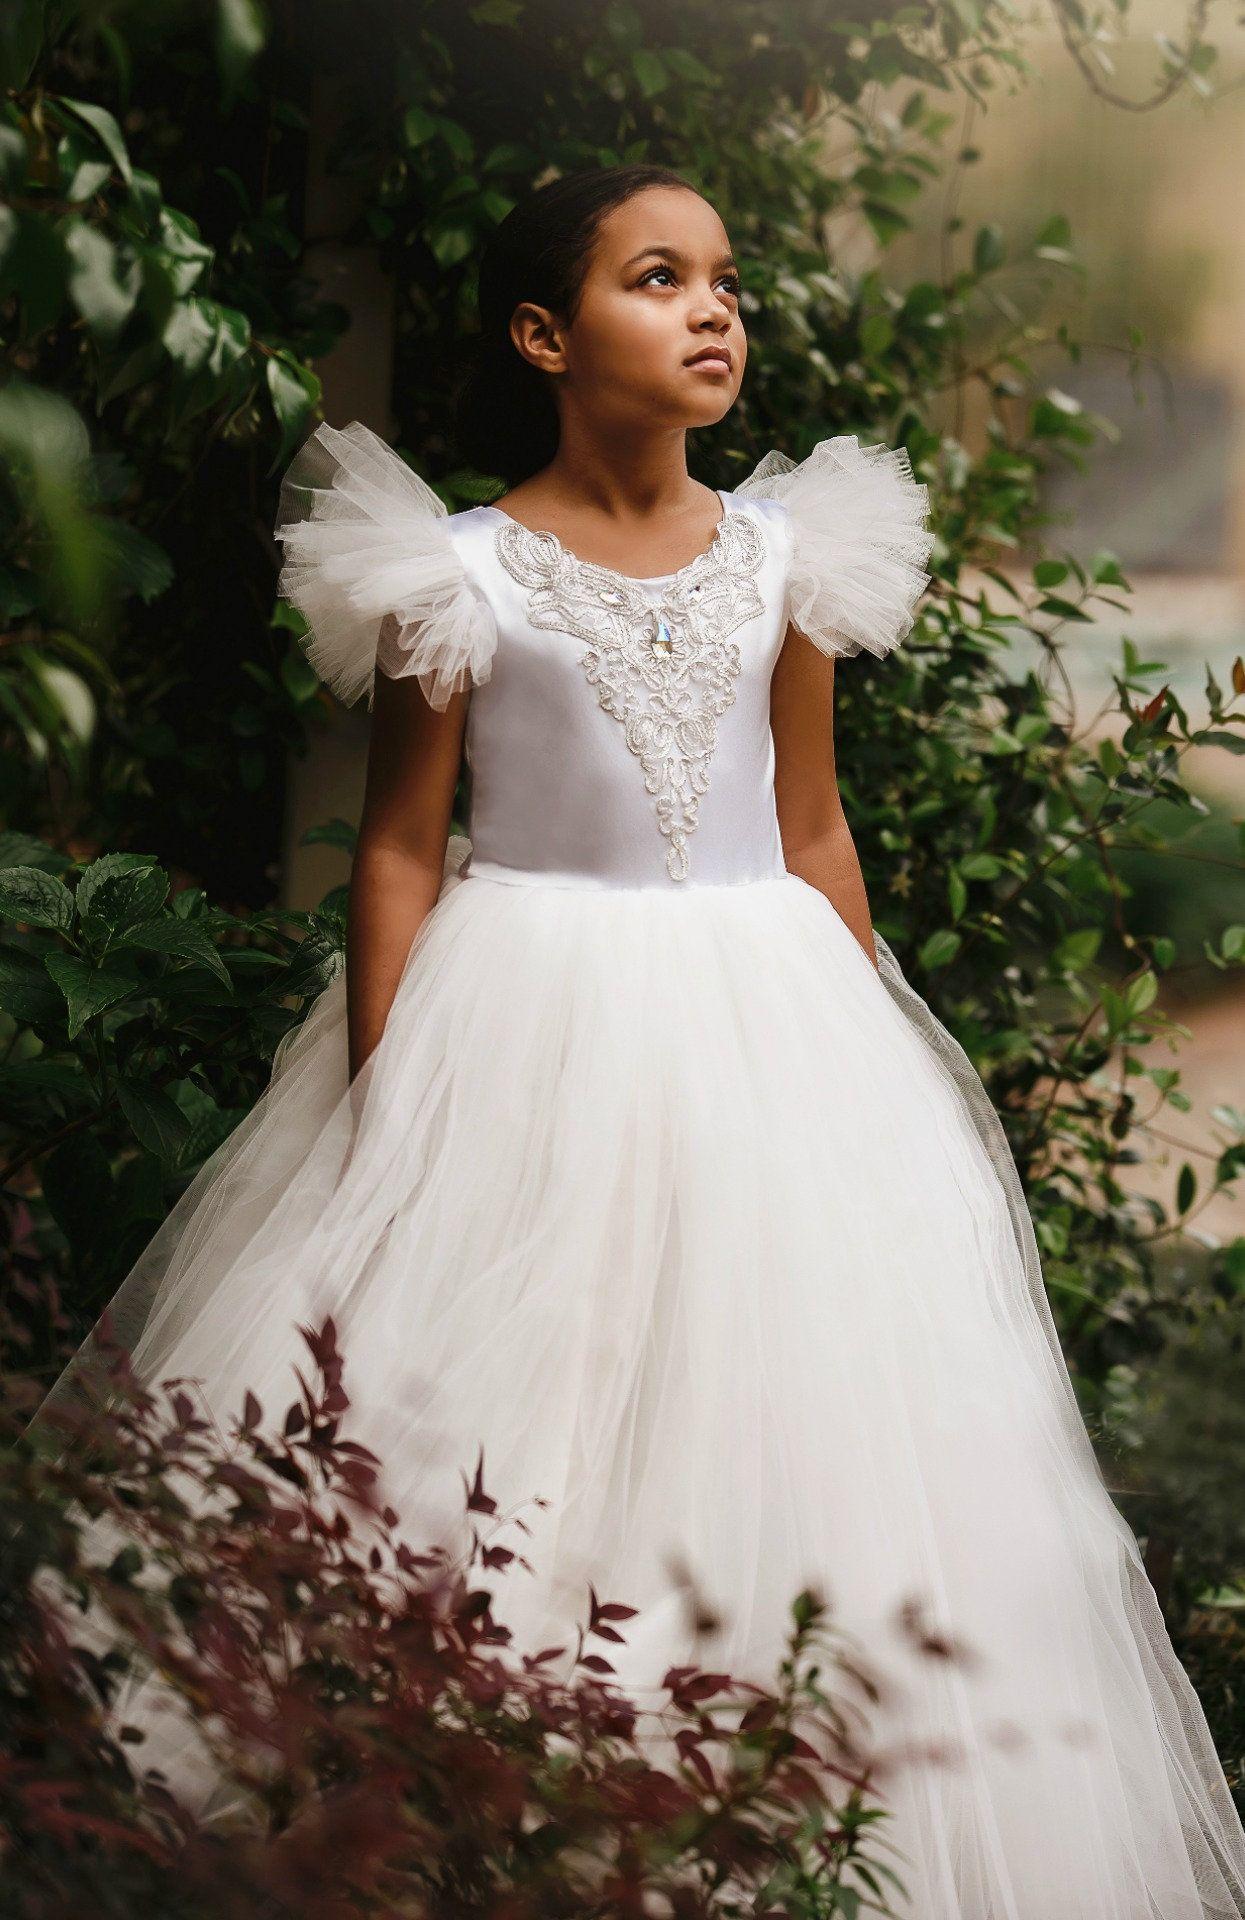 387c2dc41f4f Cinderella Inspired Flower Girl Dress Perfect for Disney Wedding or ...